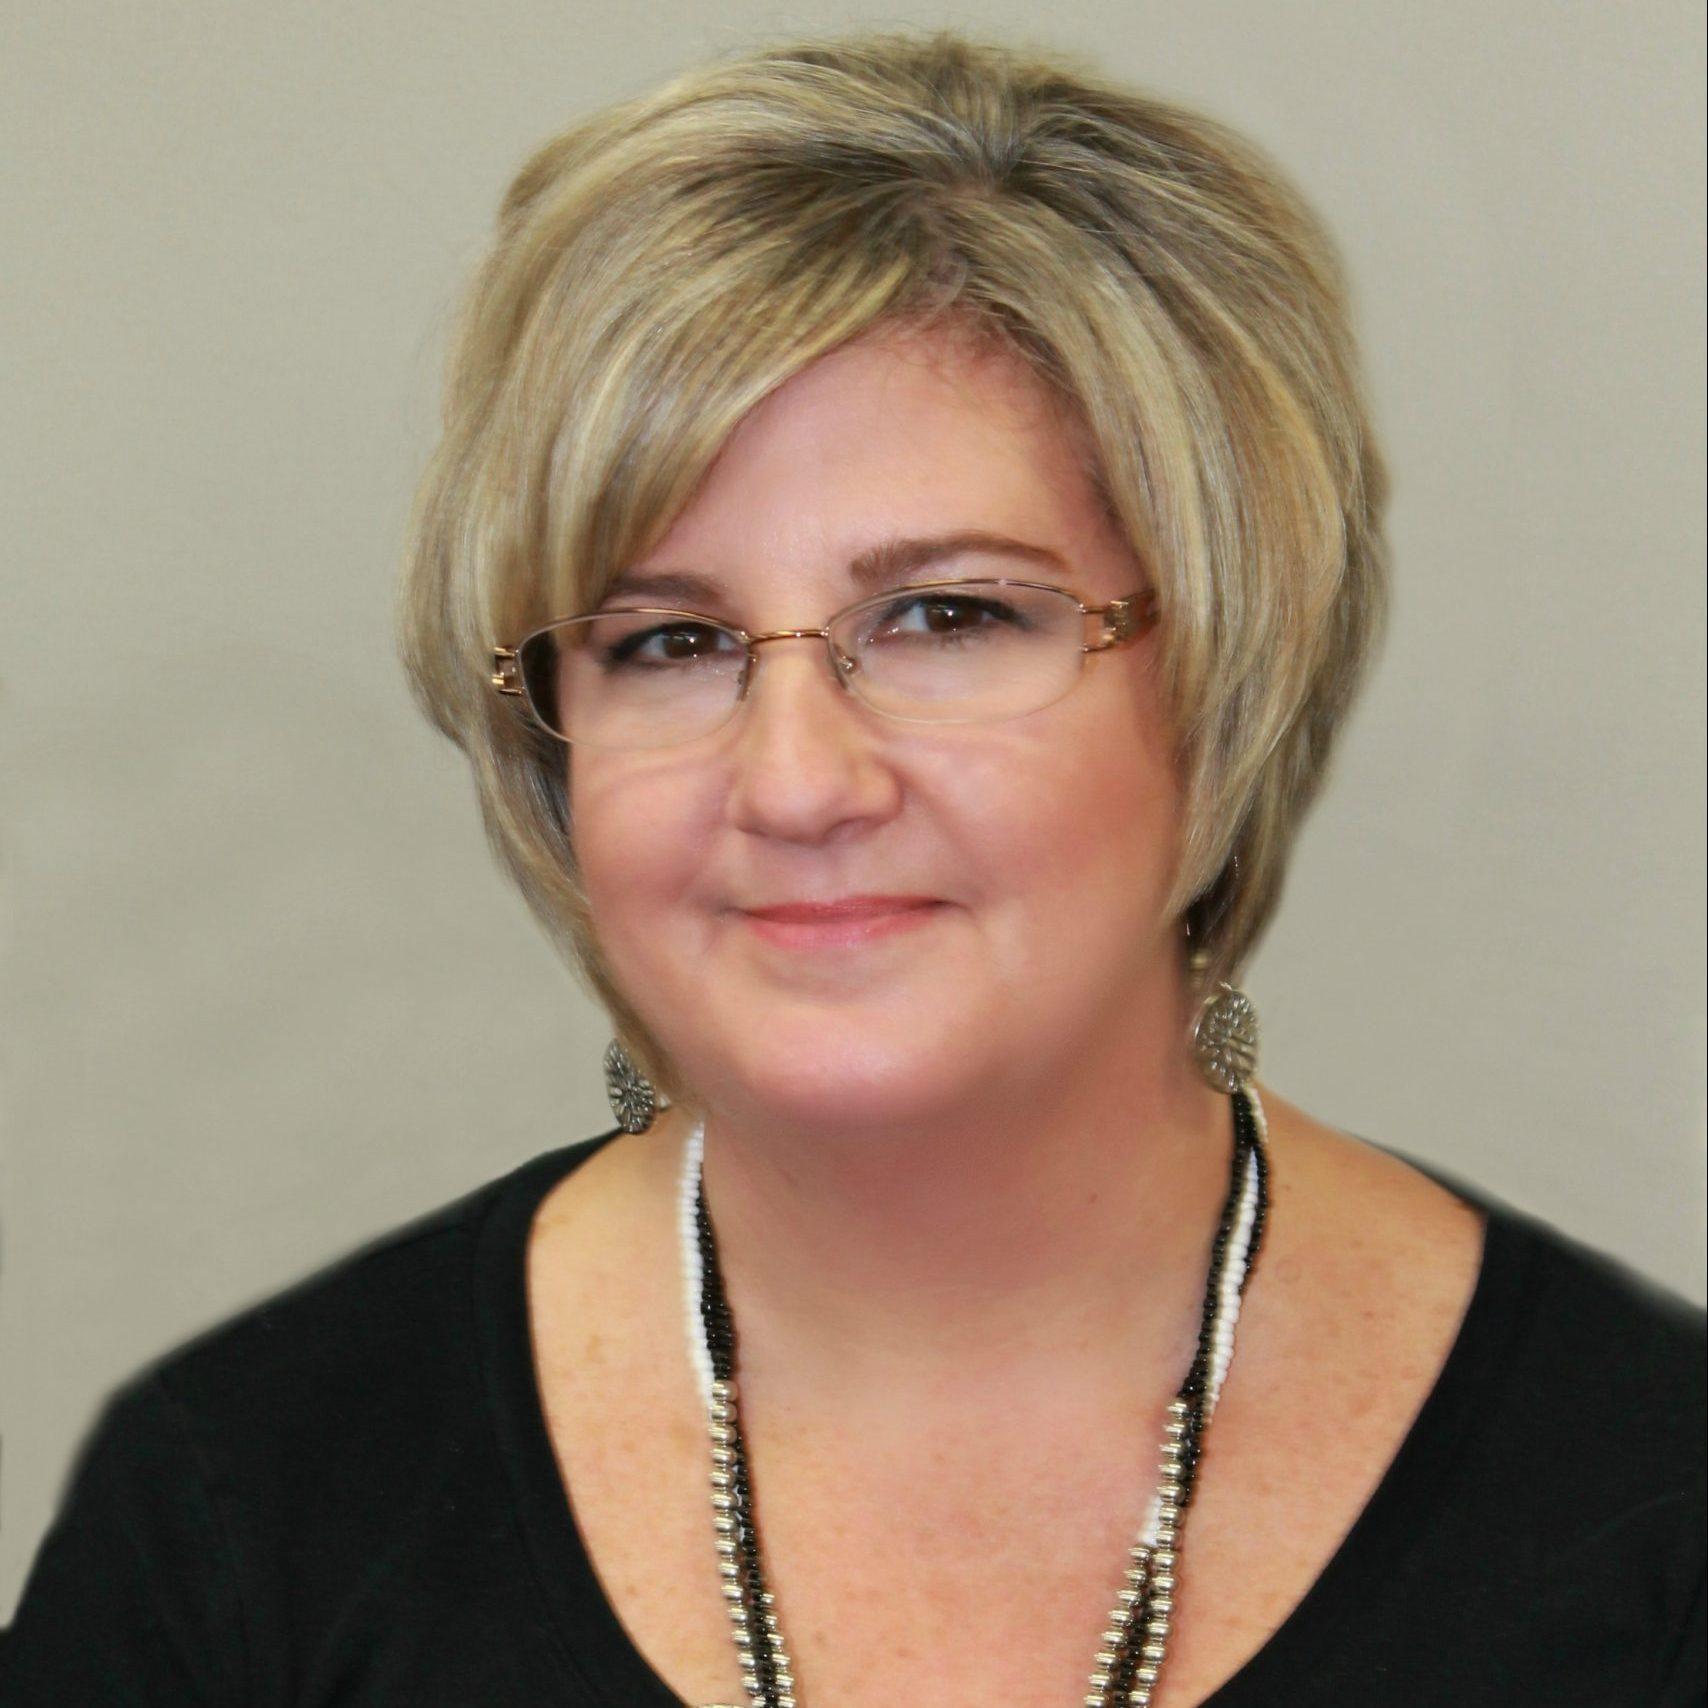 A photo of Lisa wearing a black shirt and smiling at the camera.